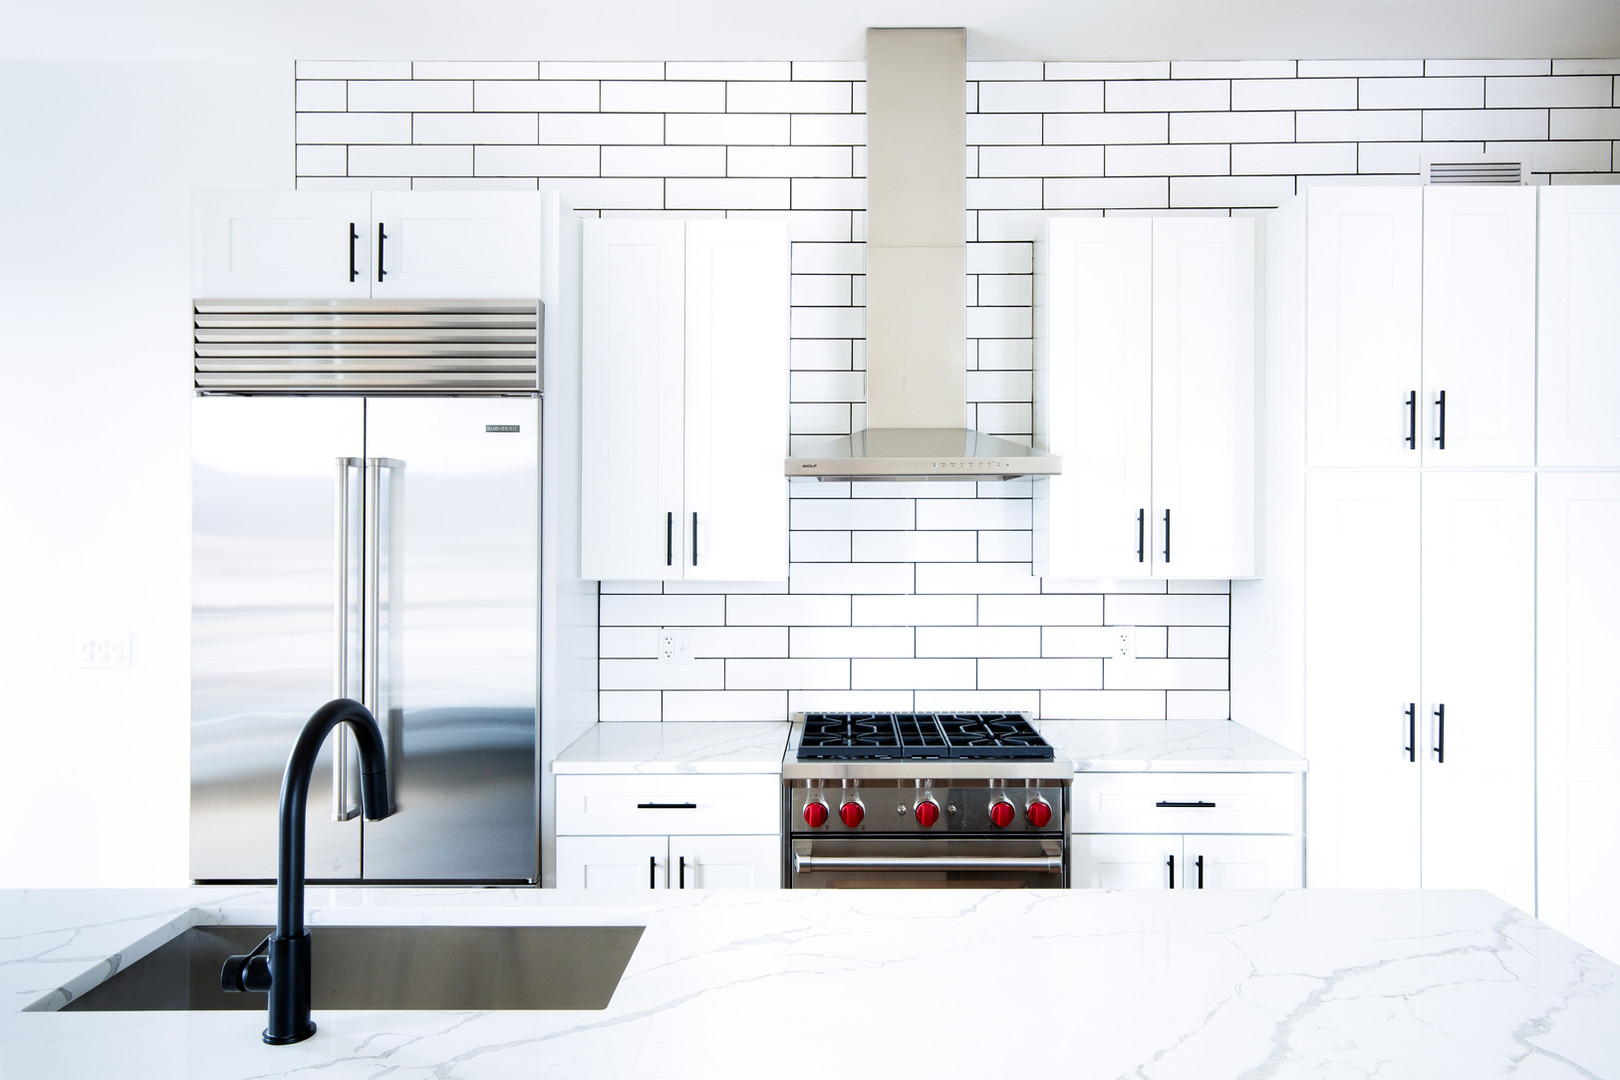 Penthouse kitchen detail